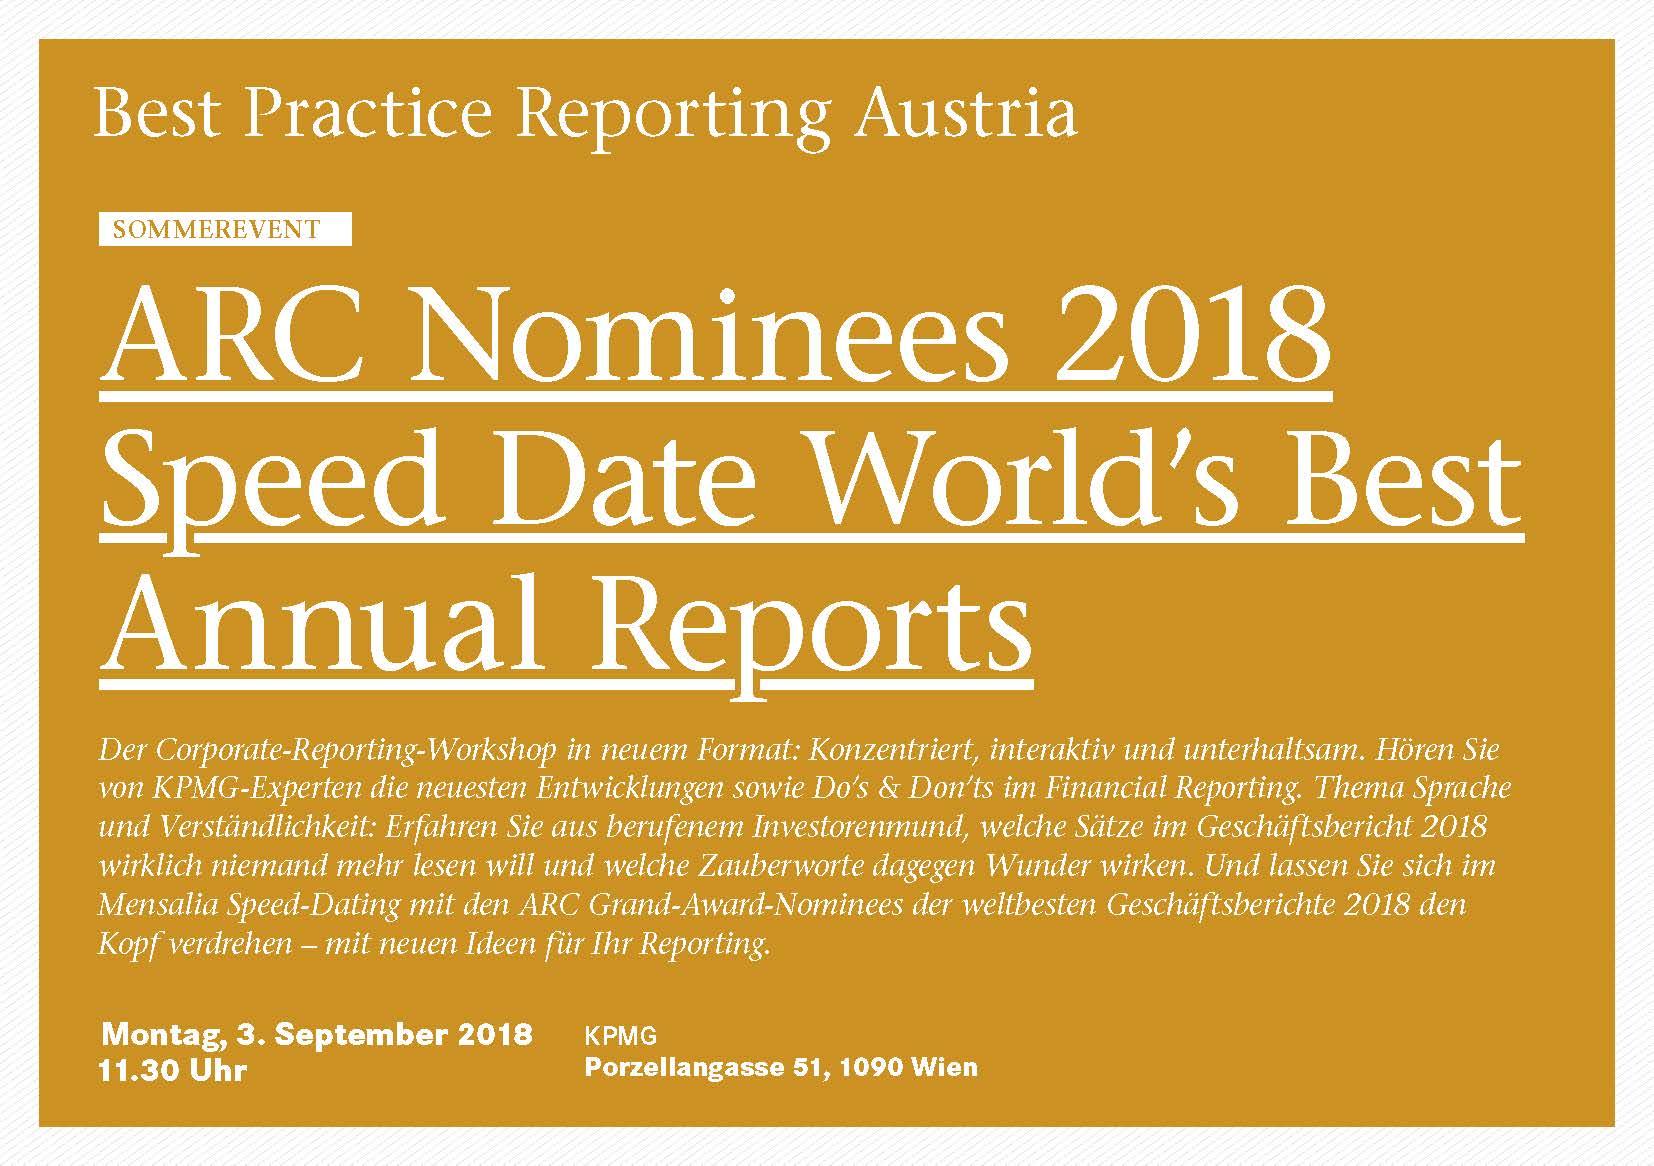 BPRA Veranstaltung ARC Nominees 2018 Speed Date World's Best Annual Reports